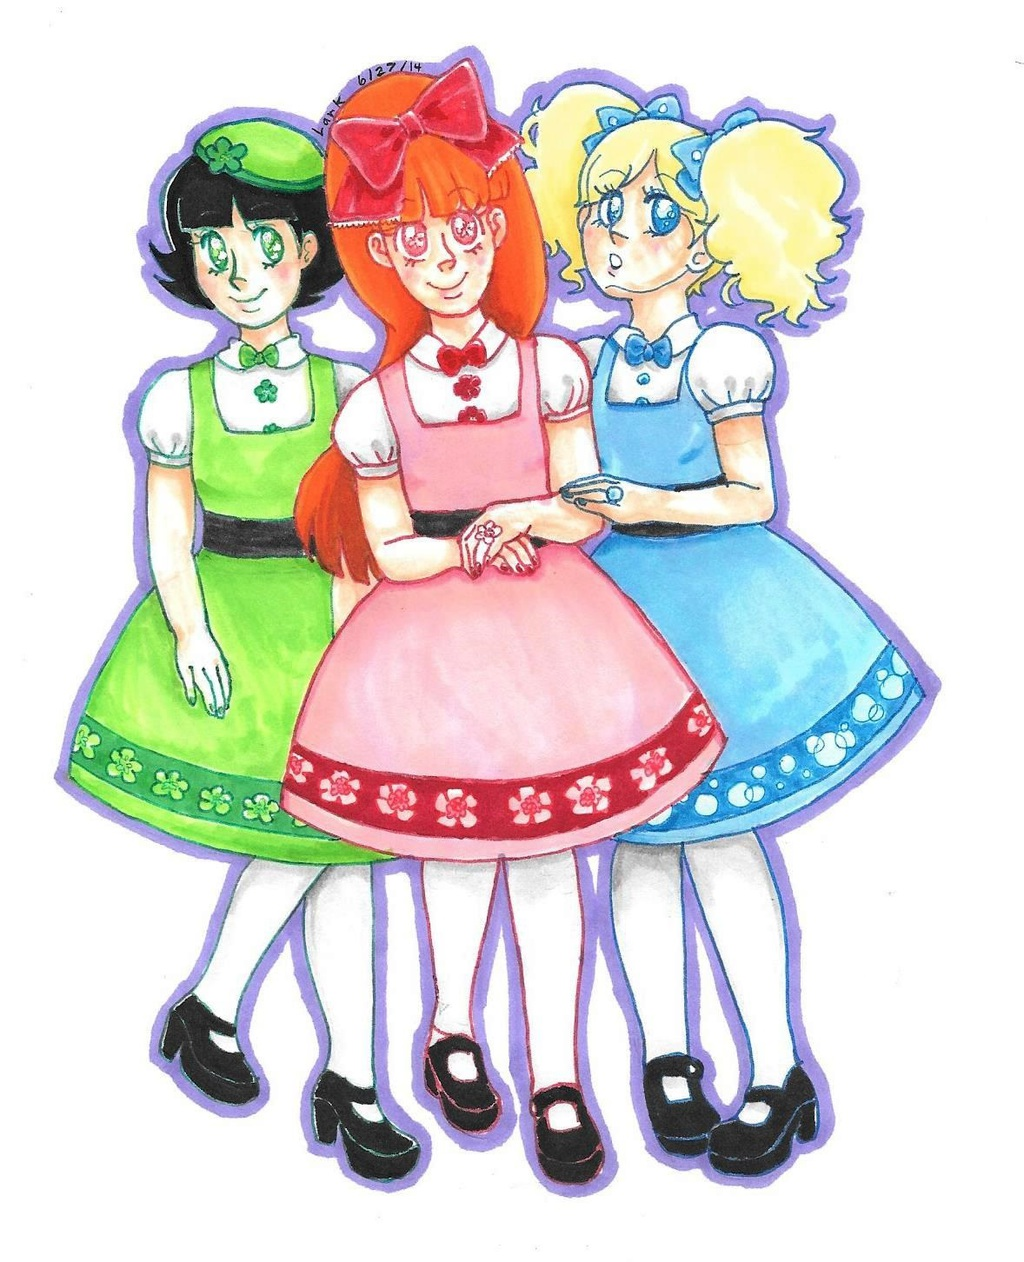 PPG lolita